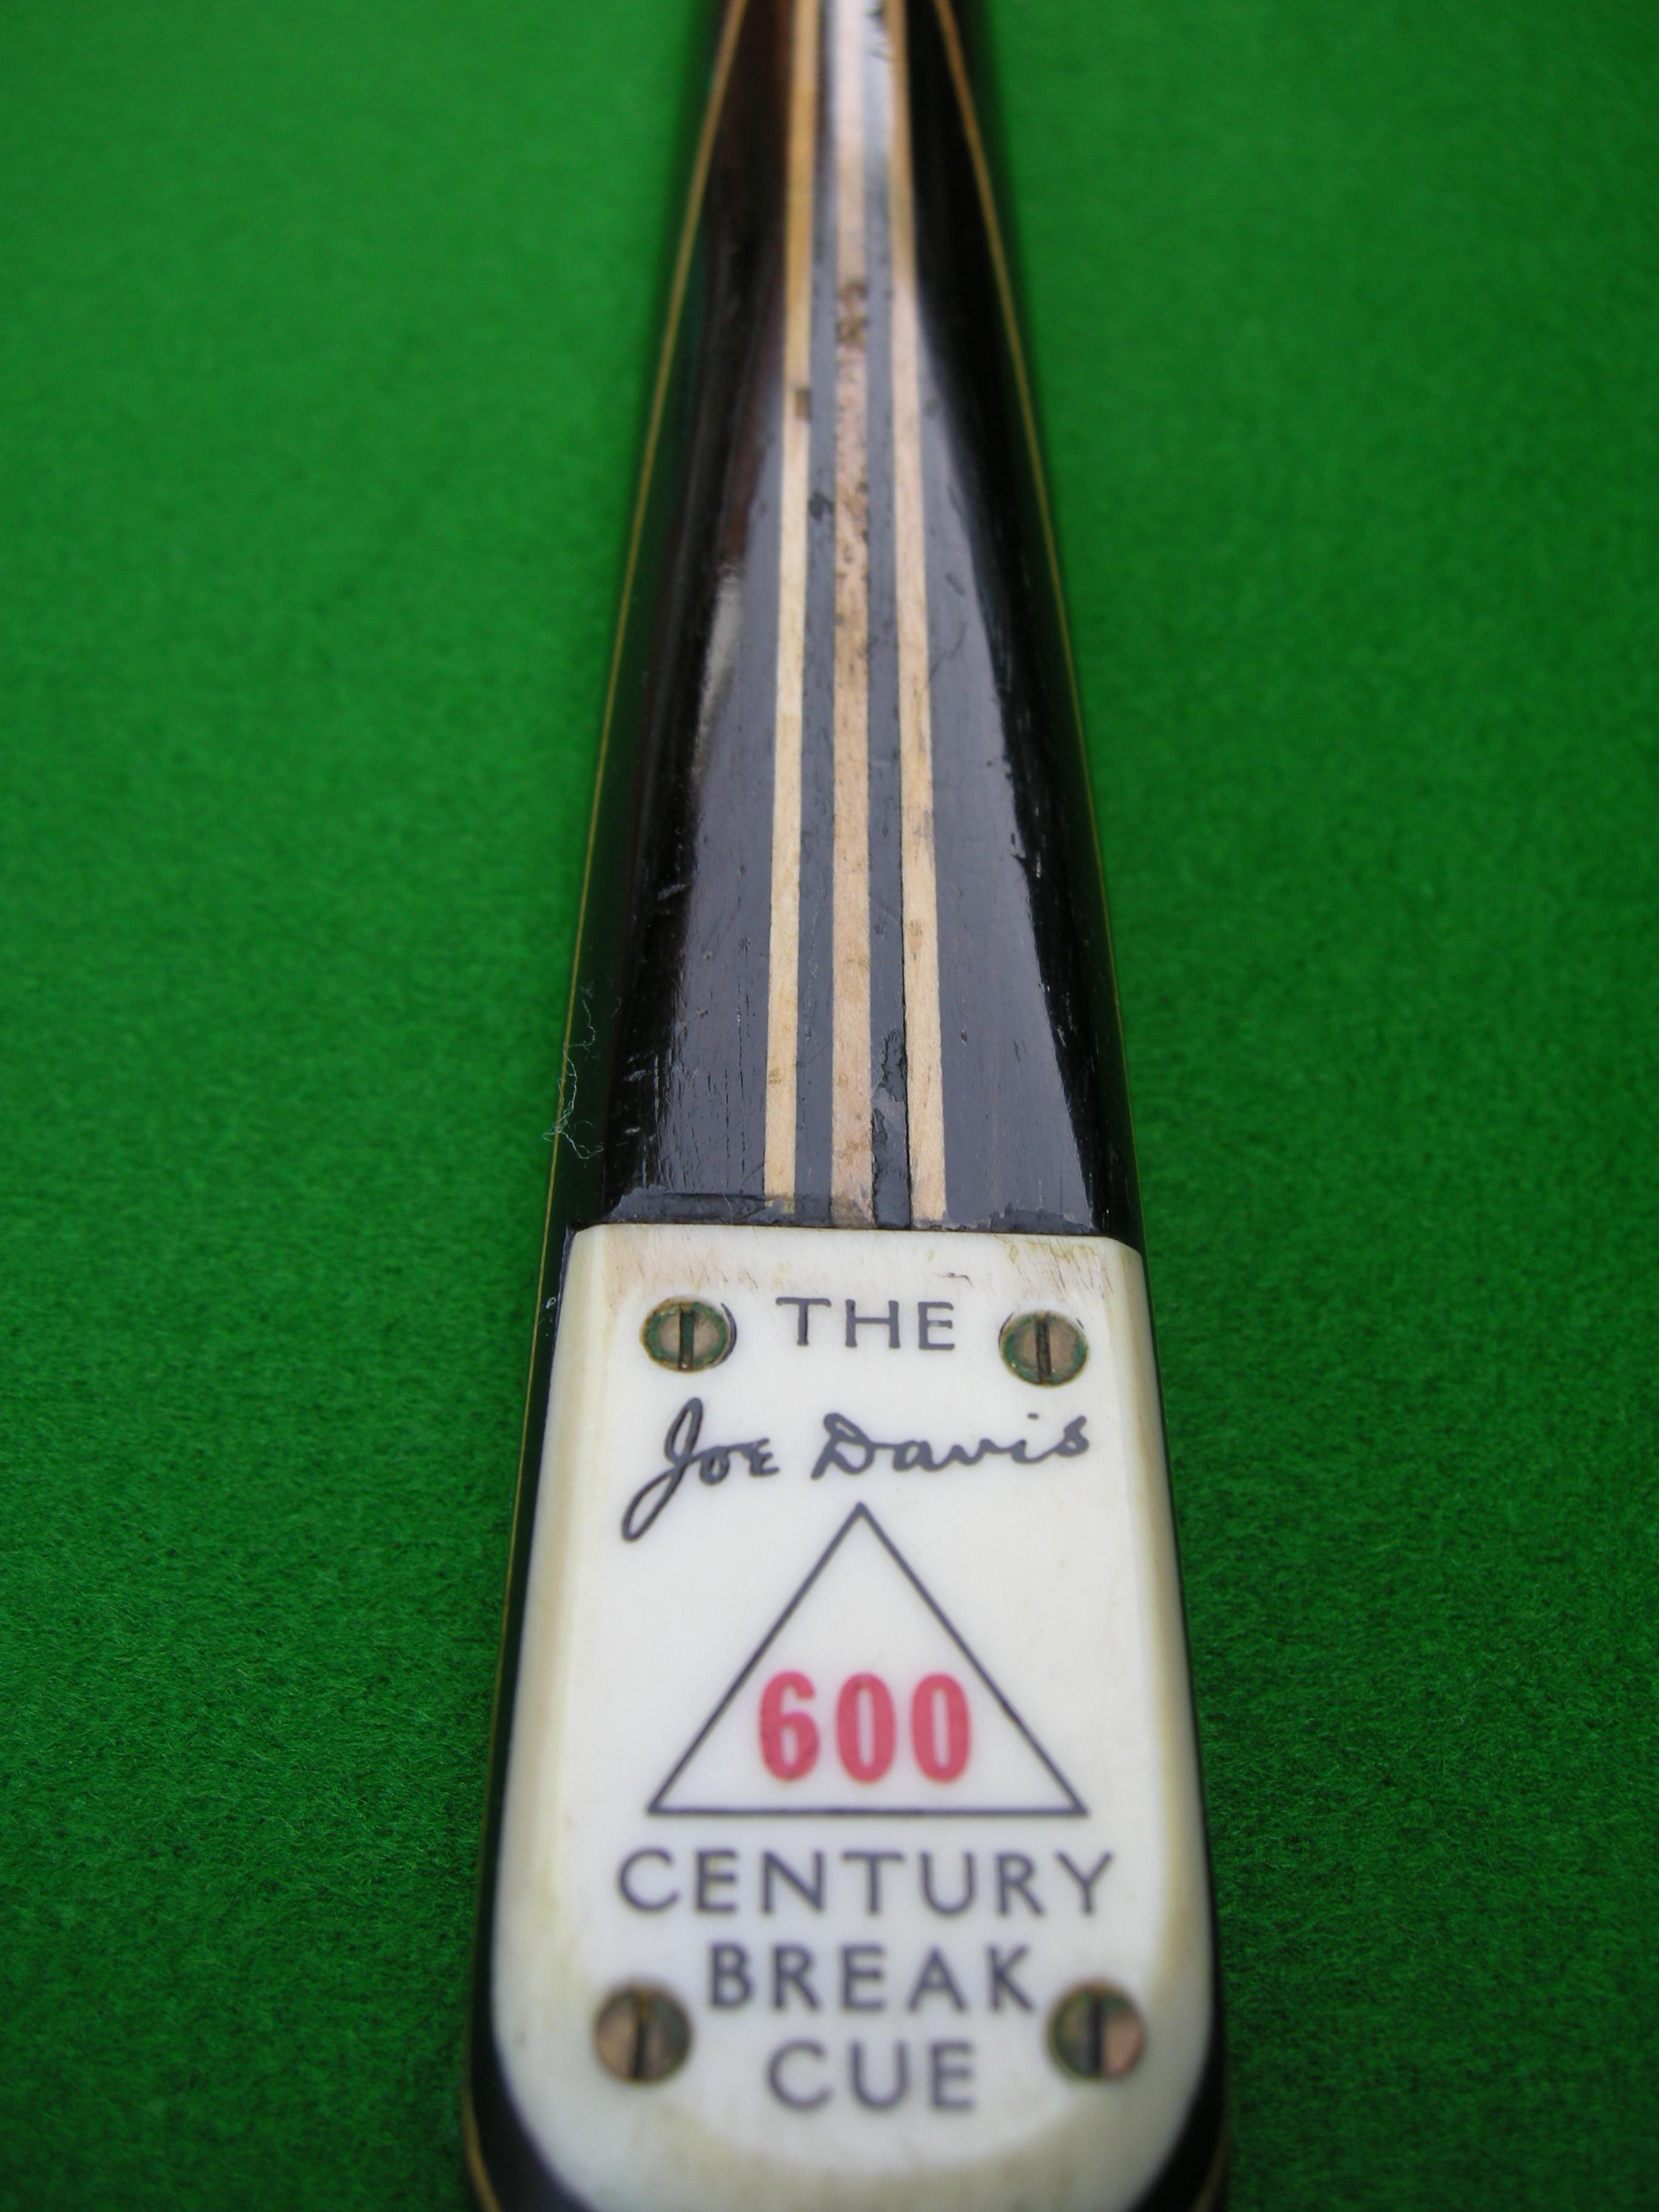 600 HS